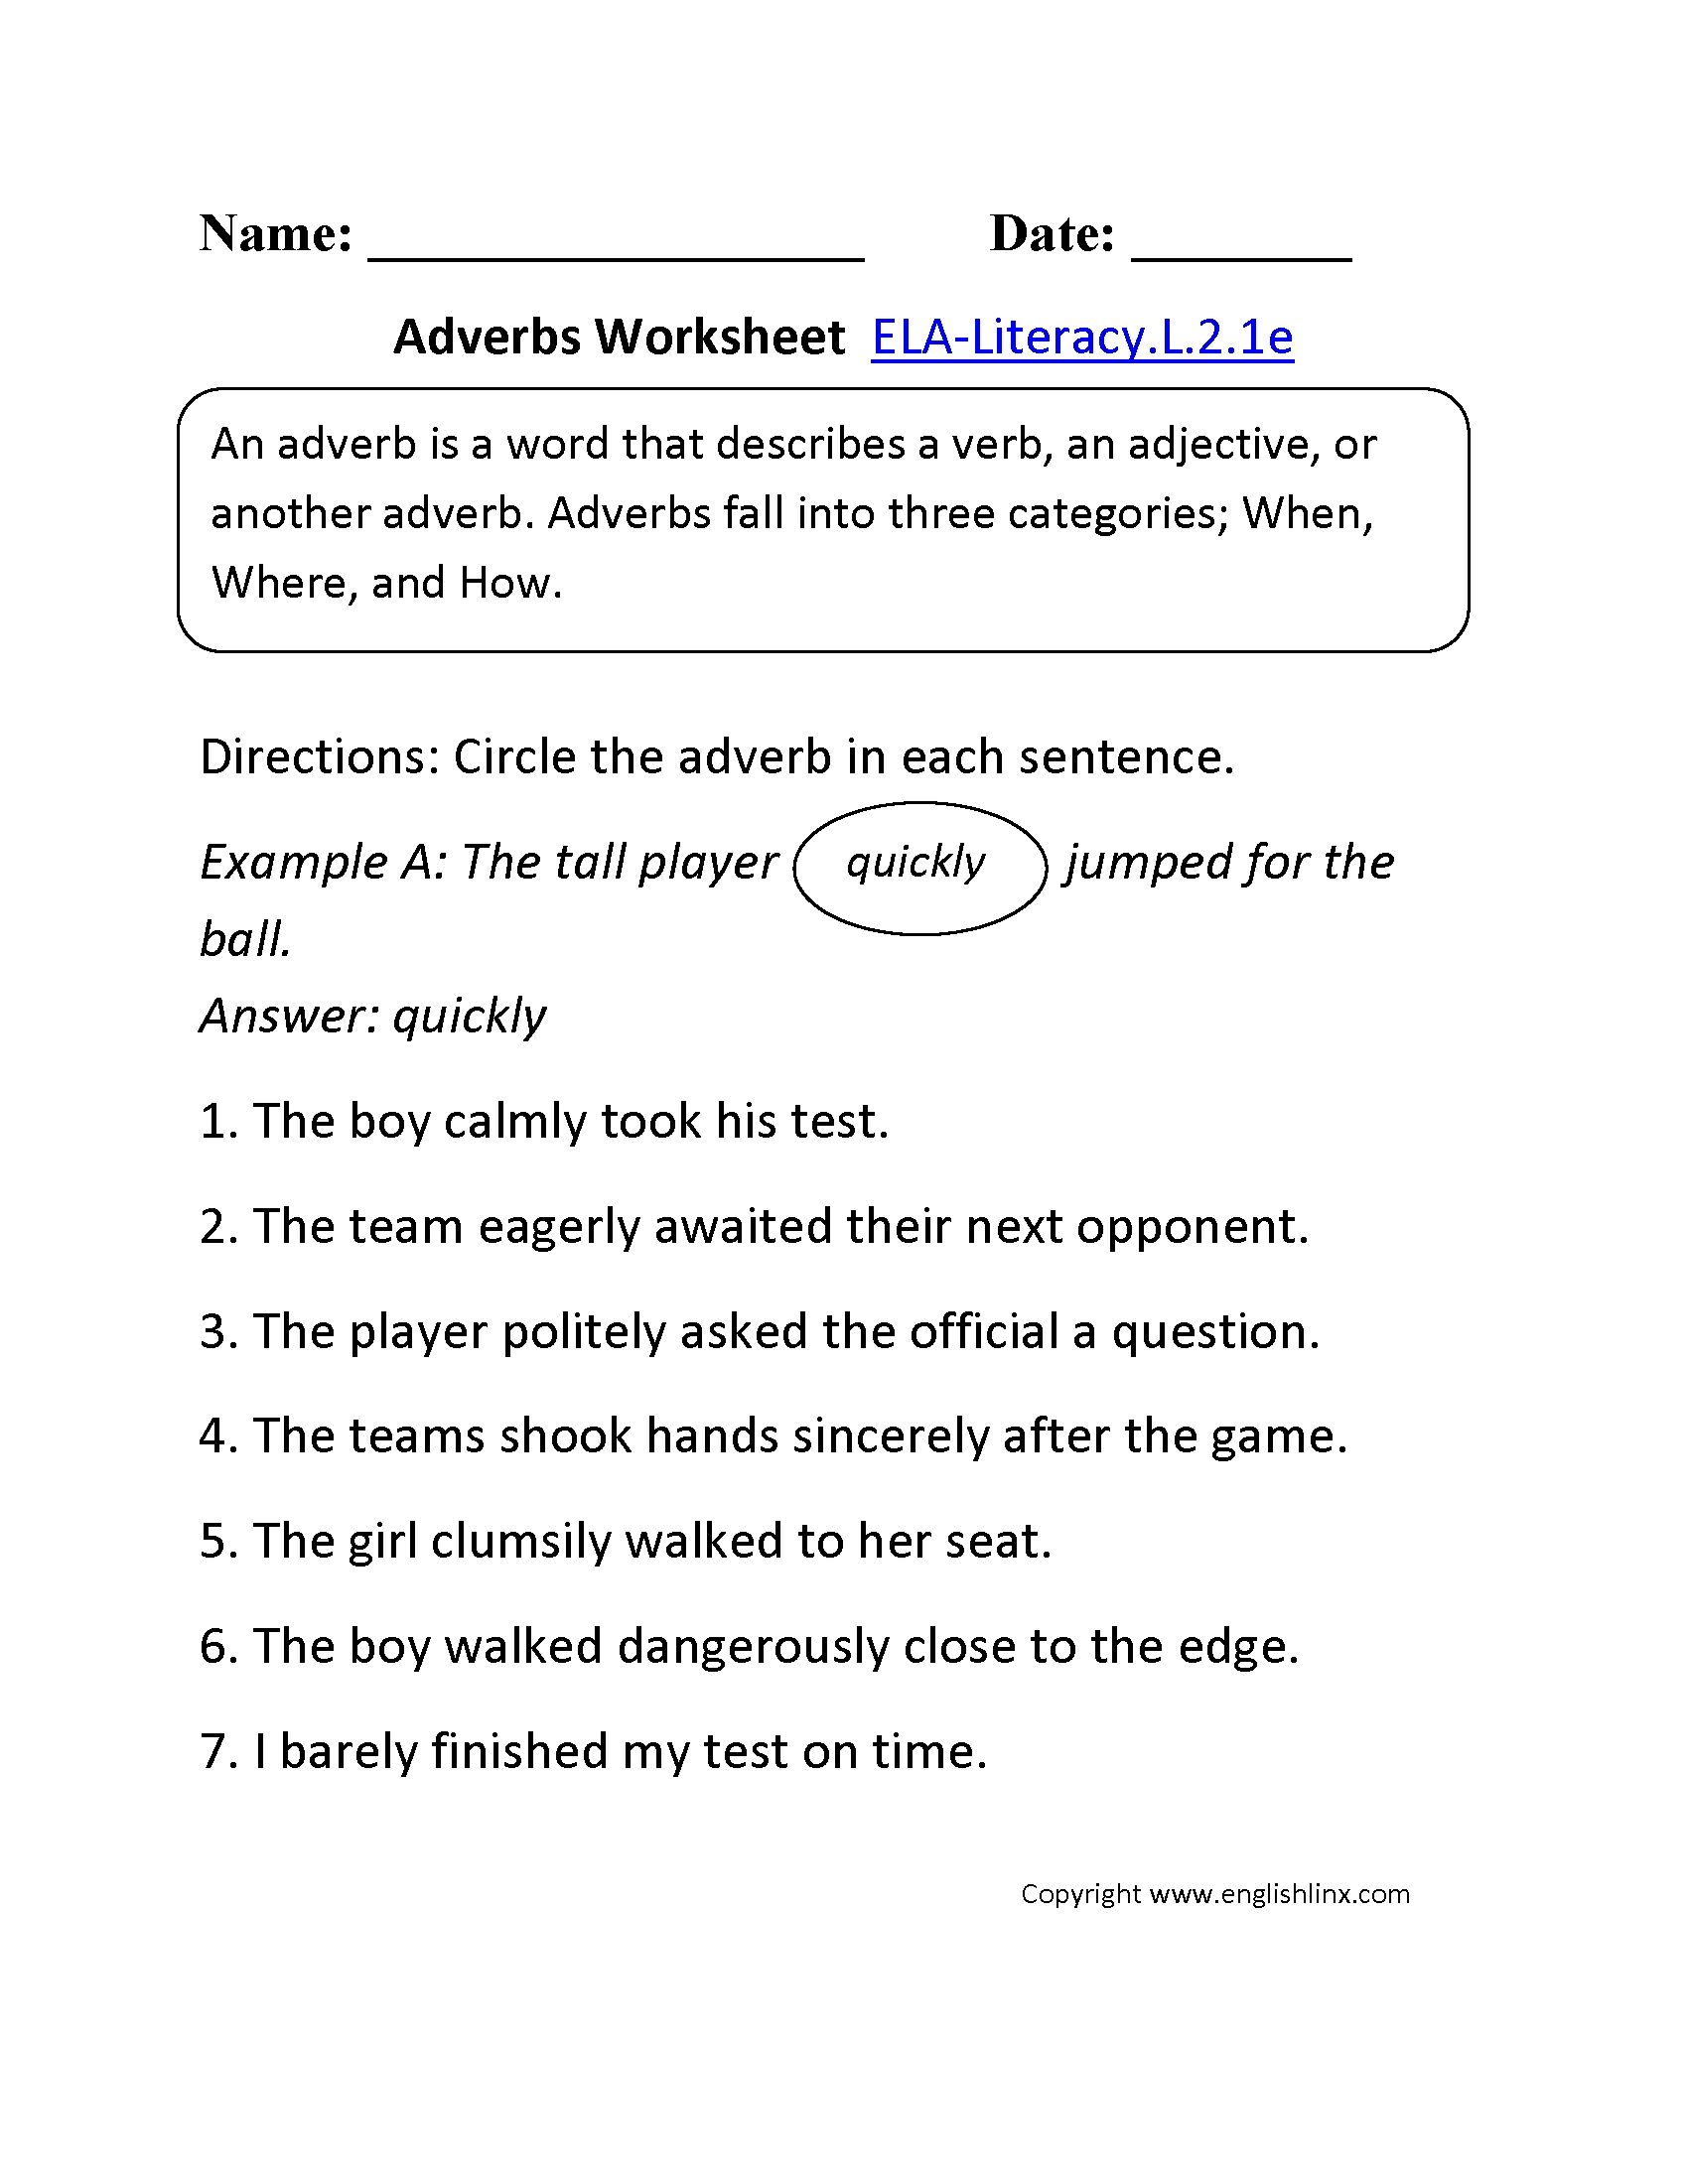 worksheet Common Core English Worksheets format 2nd grade common core language worksheets grammar english